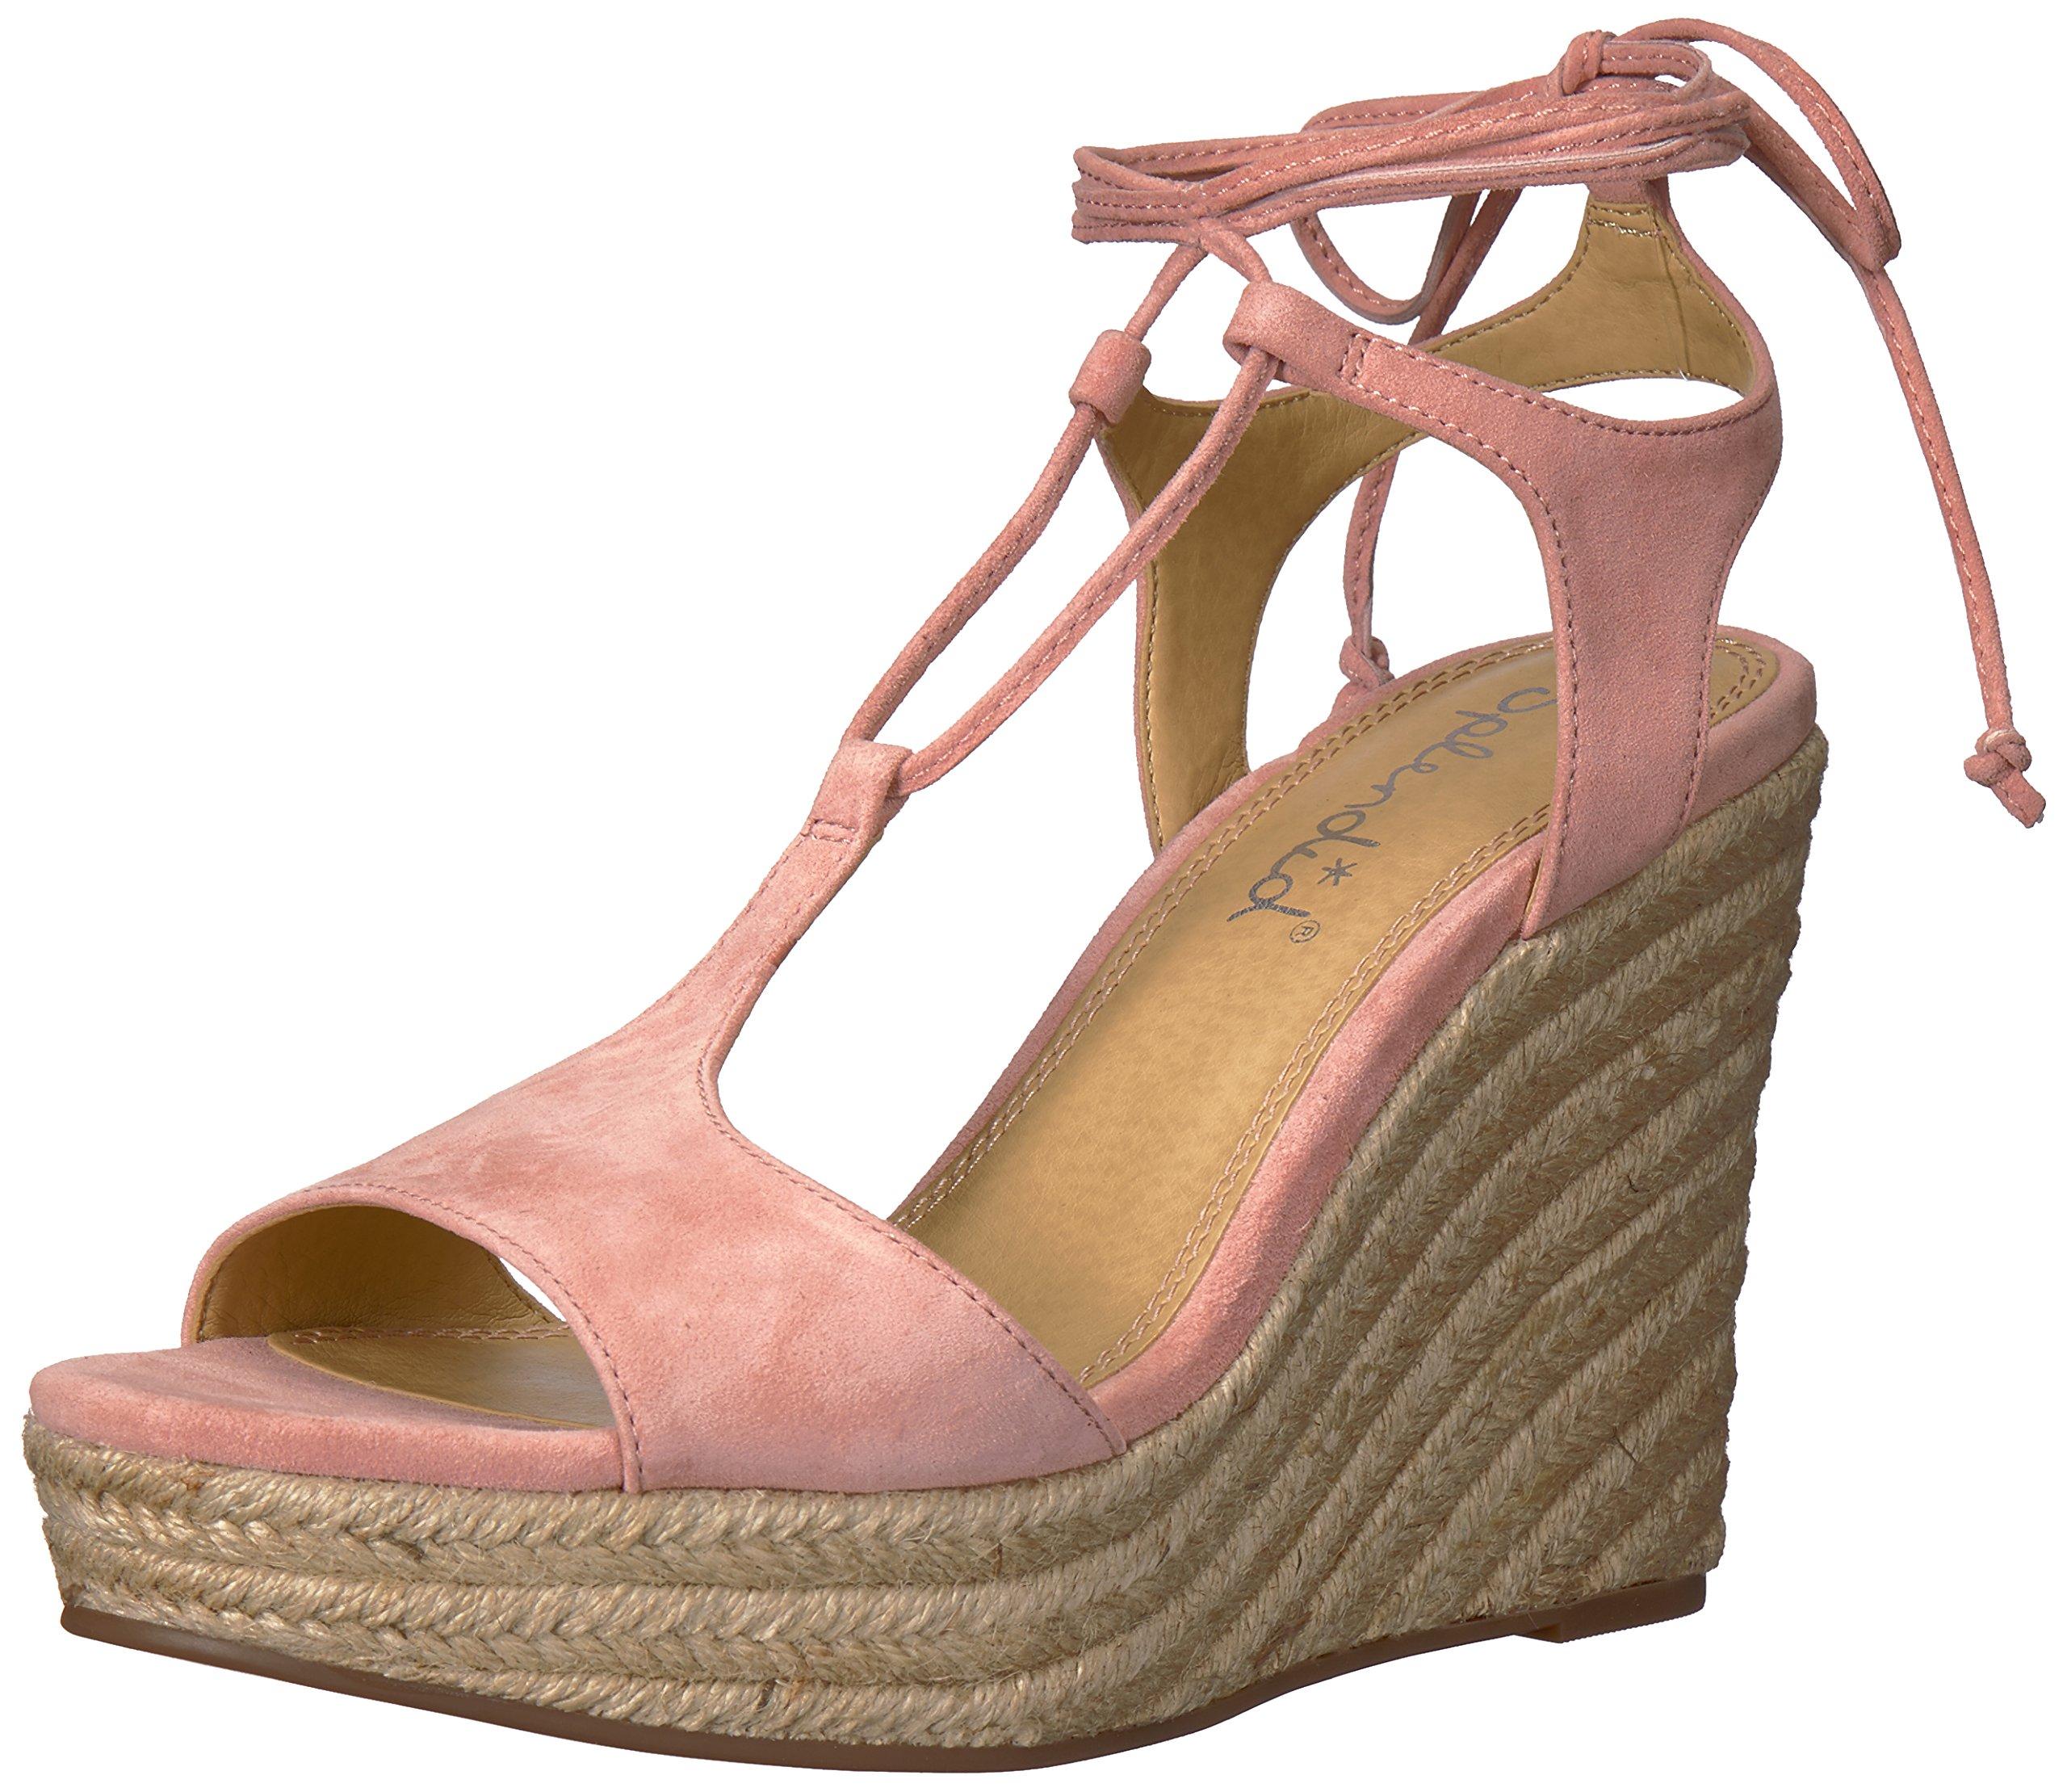 Splendid Women's Fianna Wedge Sandal, Blush, 11 Medium US